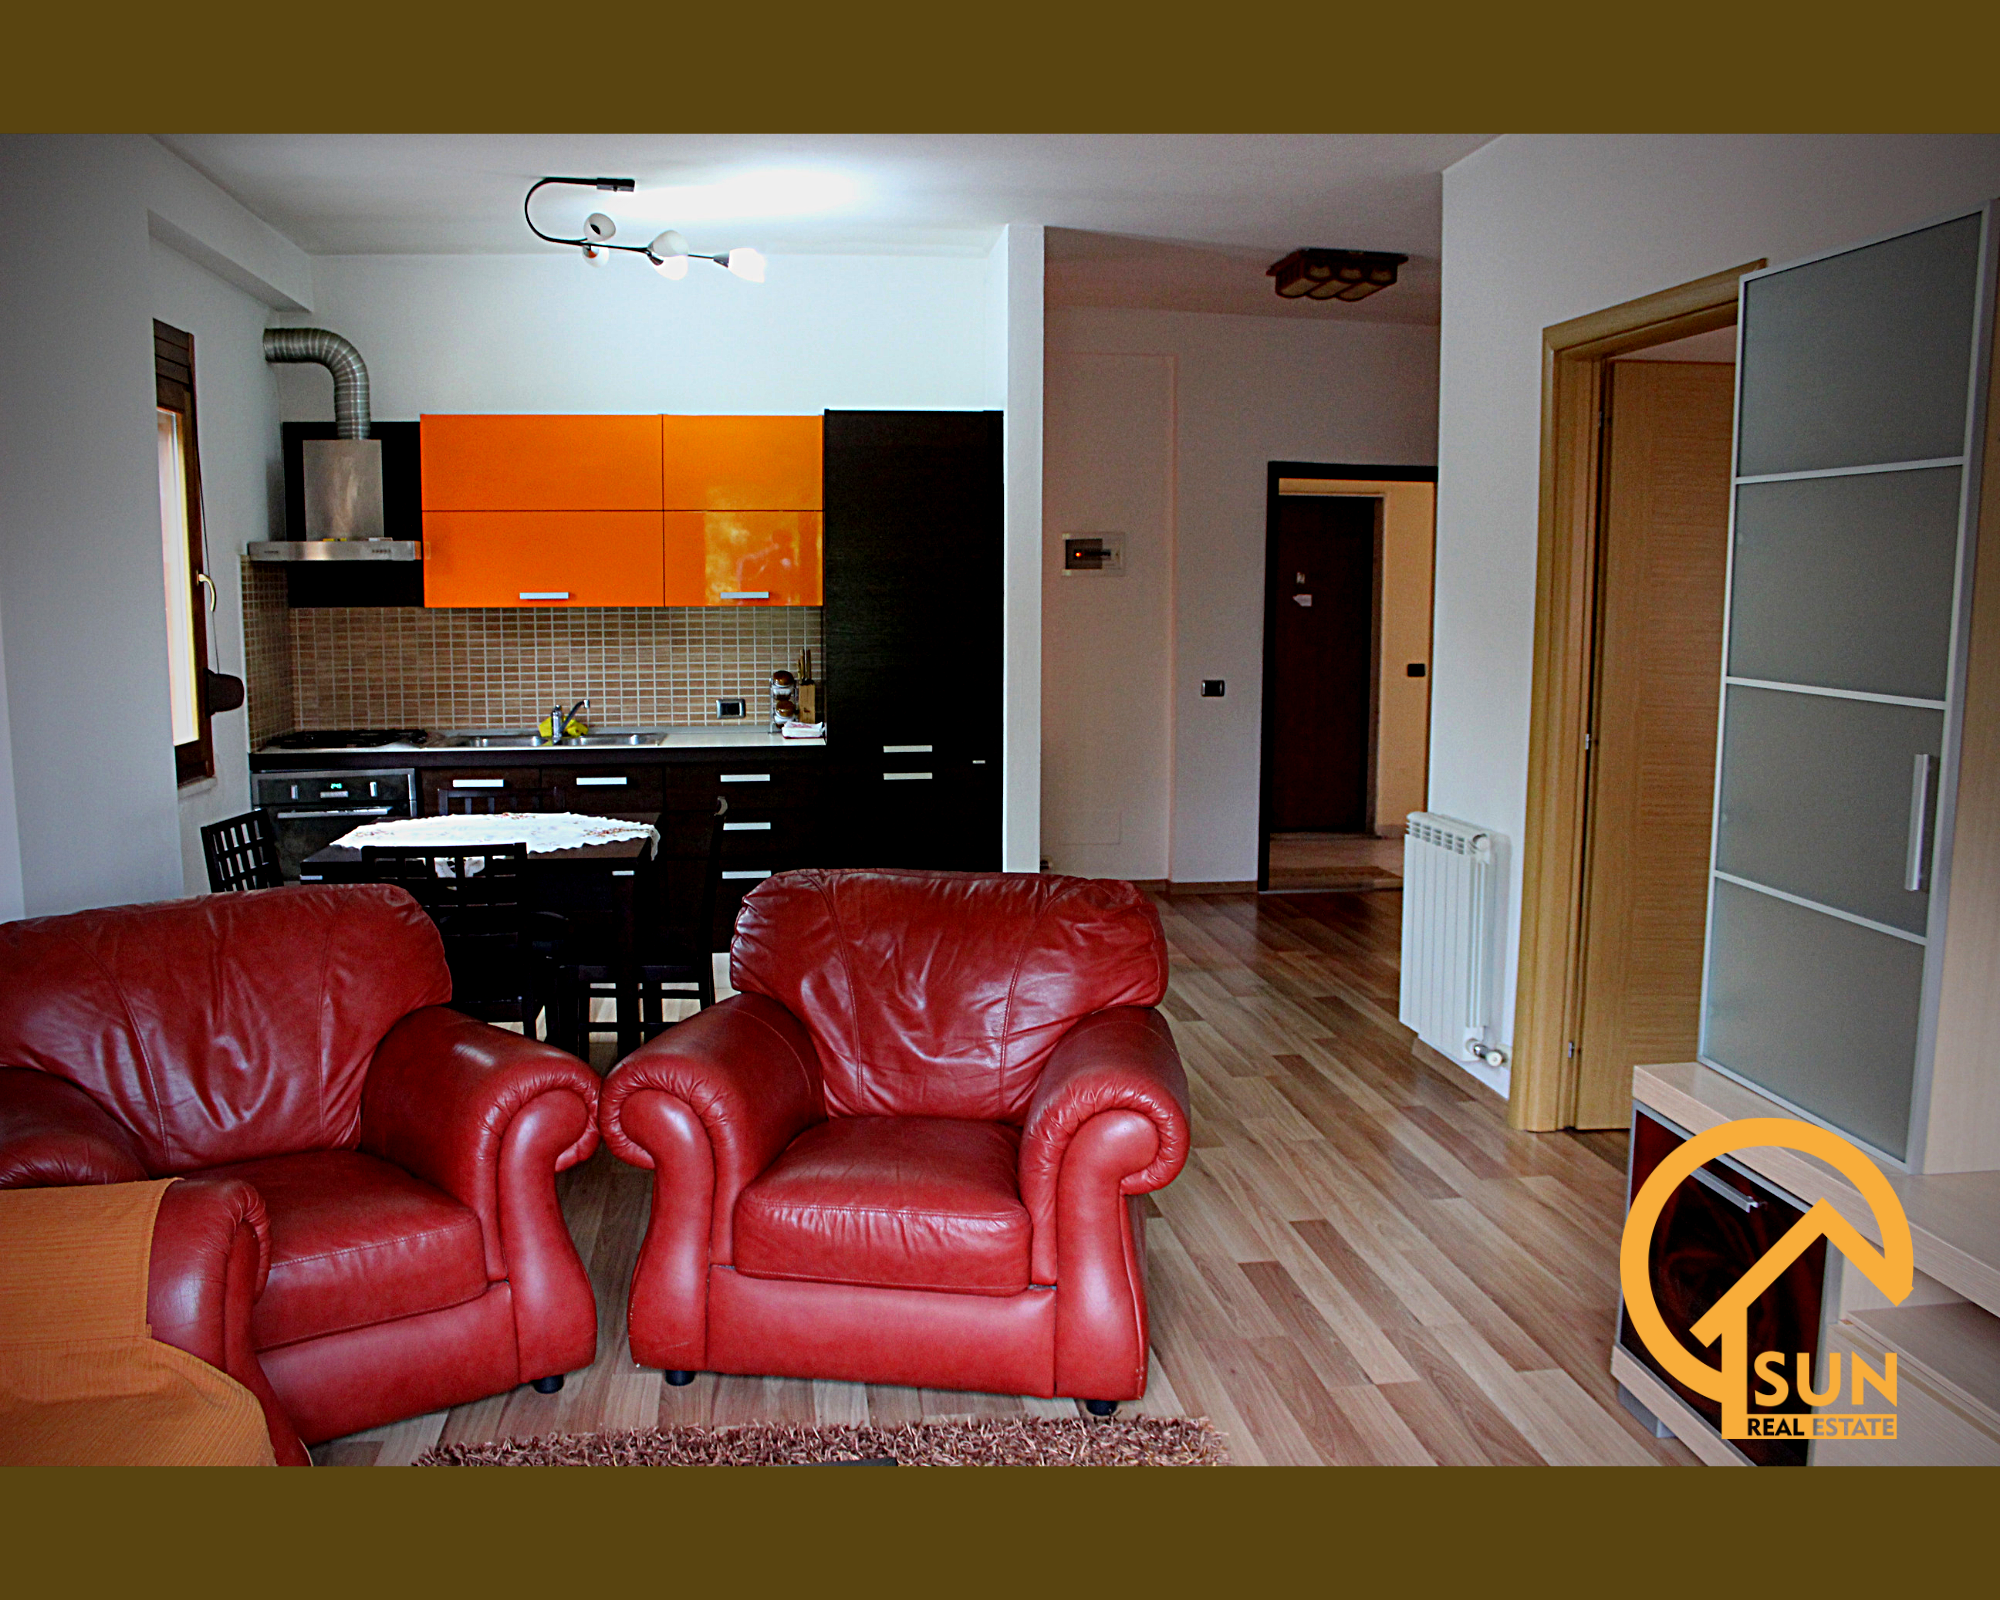 Apartament 1+1 me qira tek Elita, Shkoder